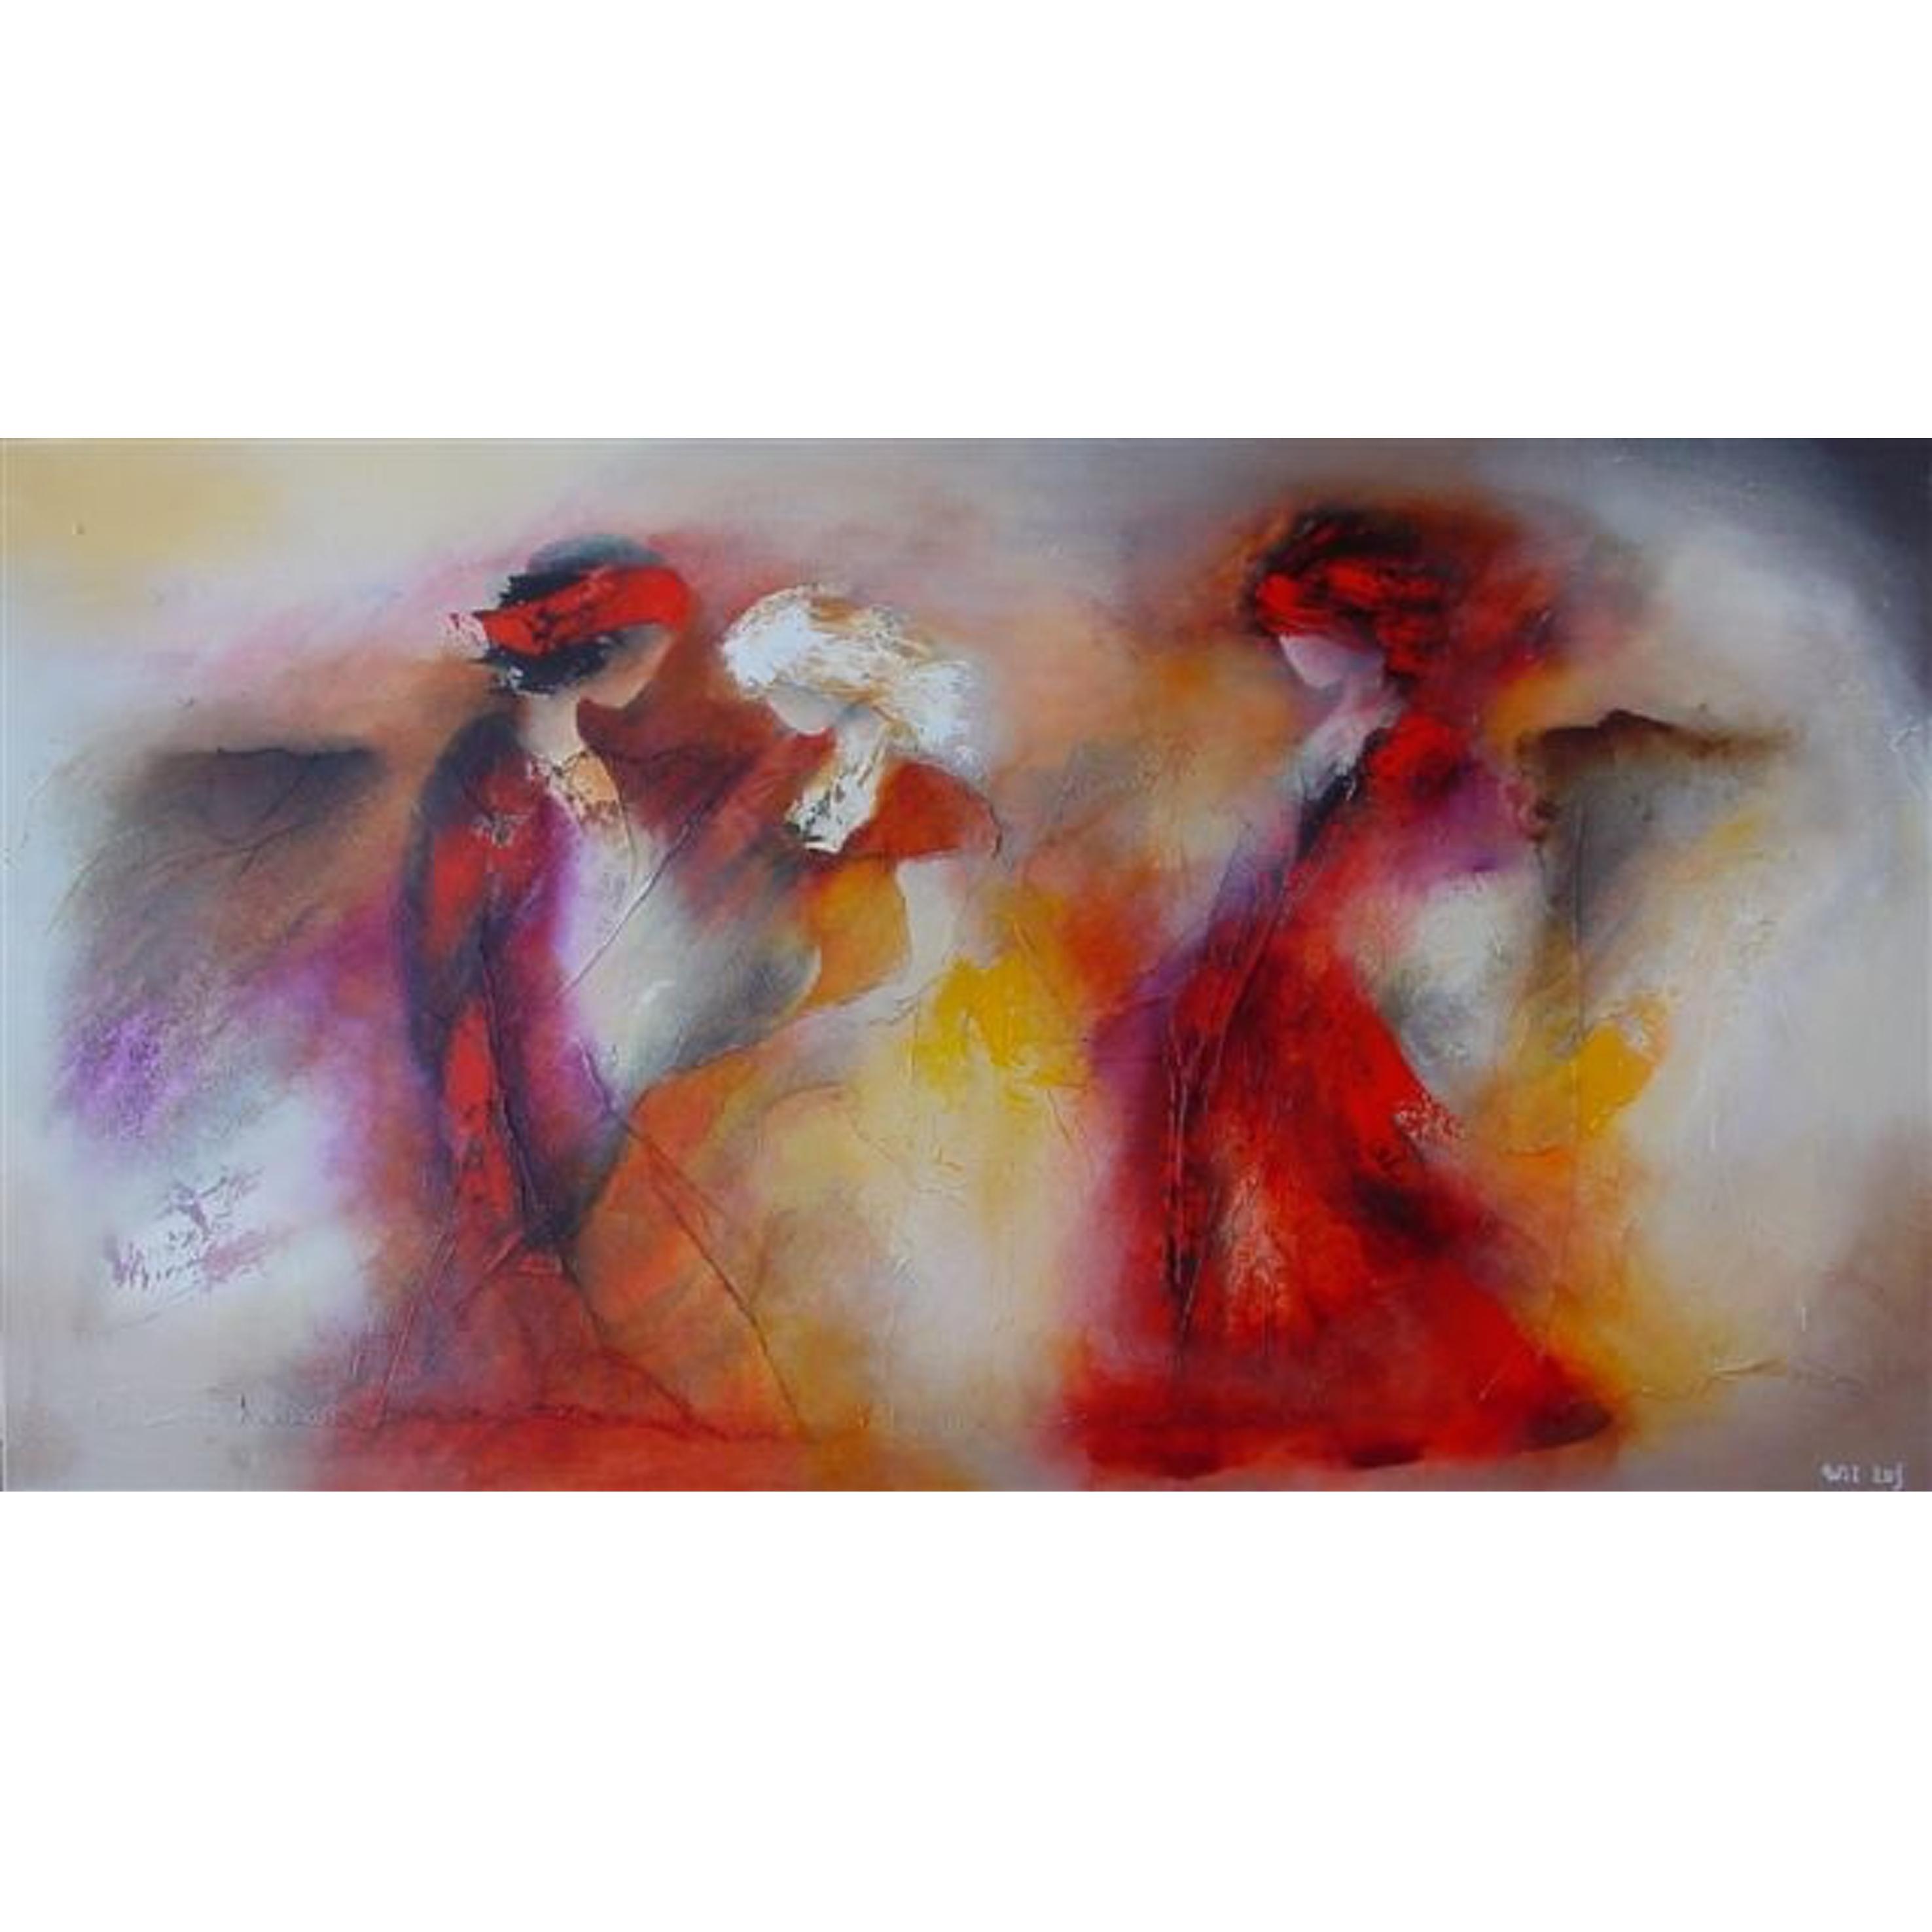 Wil lof schilderij 'Autumn' 100 x 180 cm